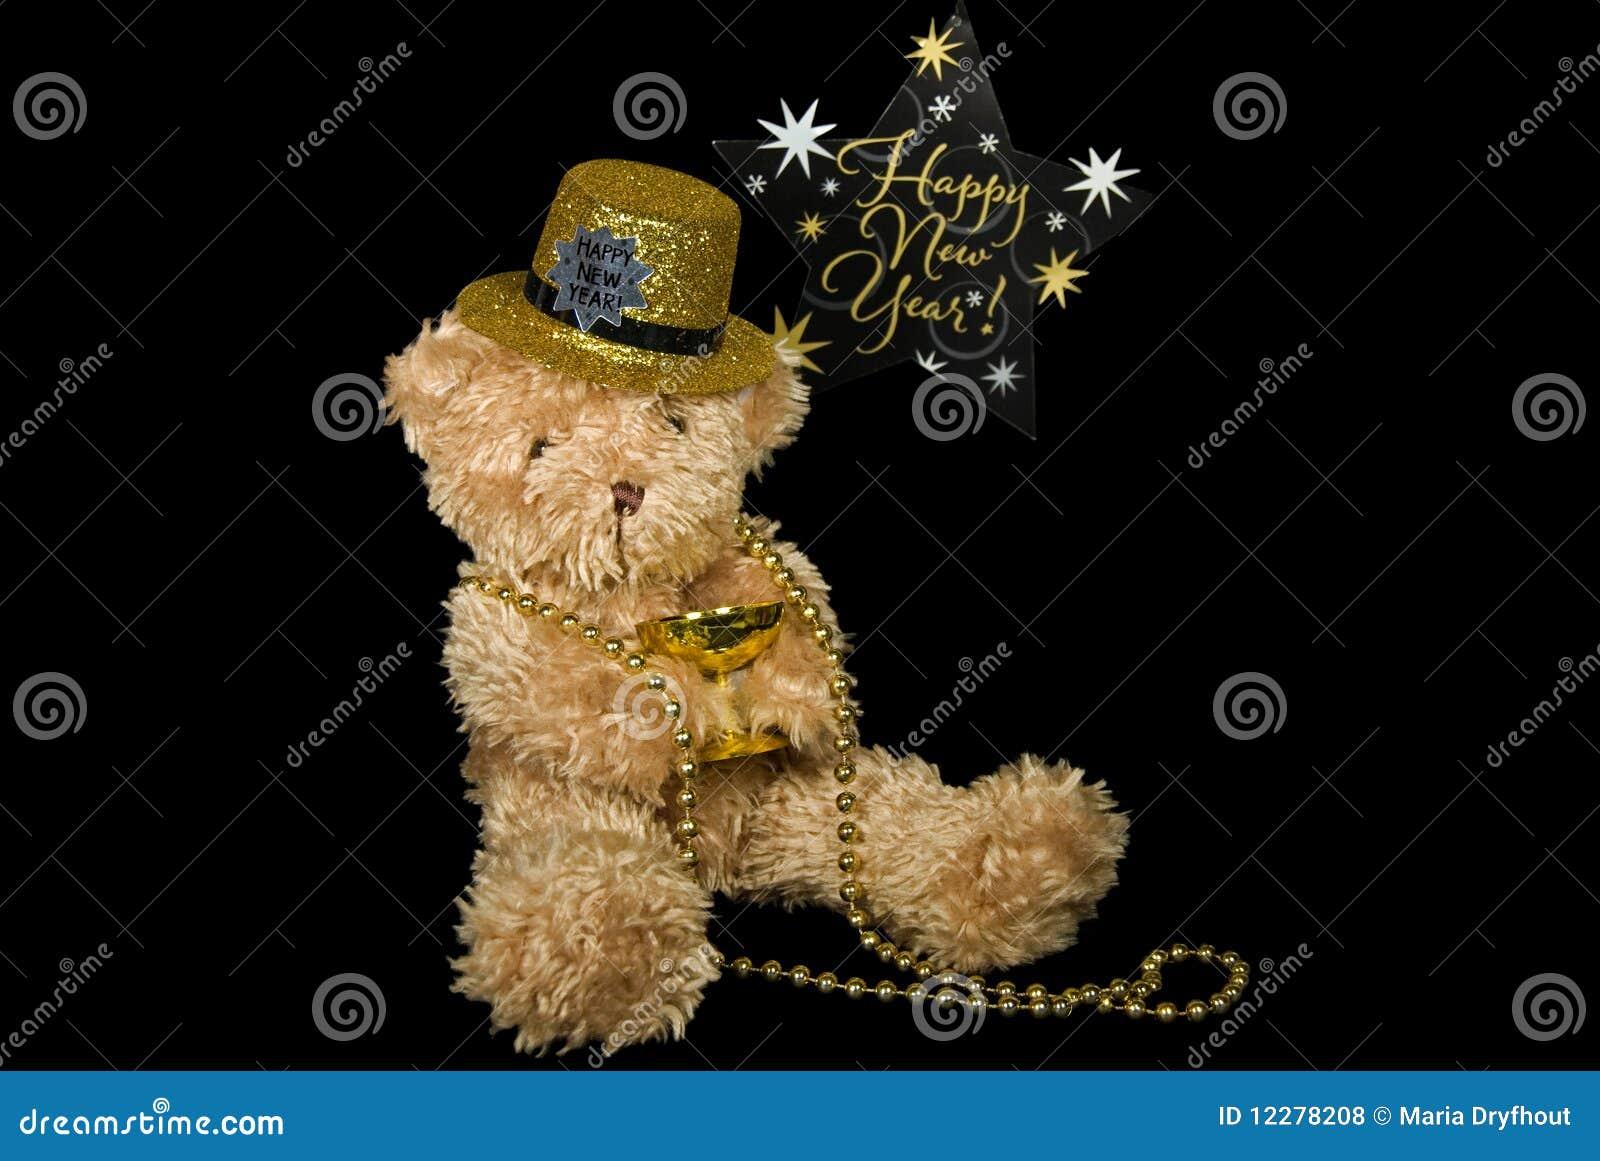 Teddy bear celebrating the New Year.